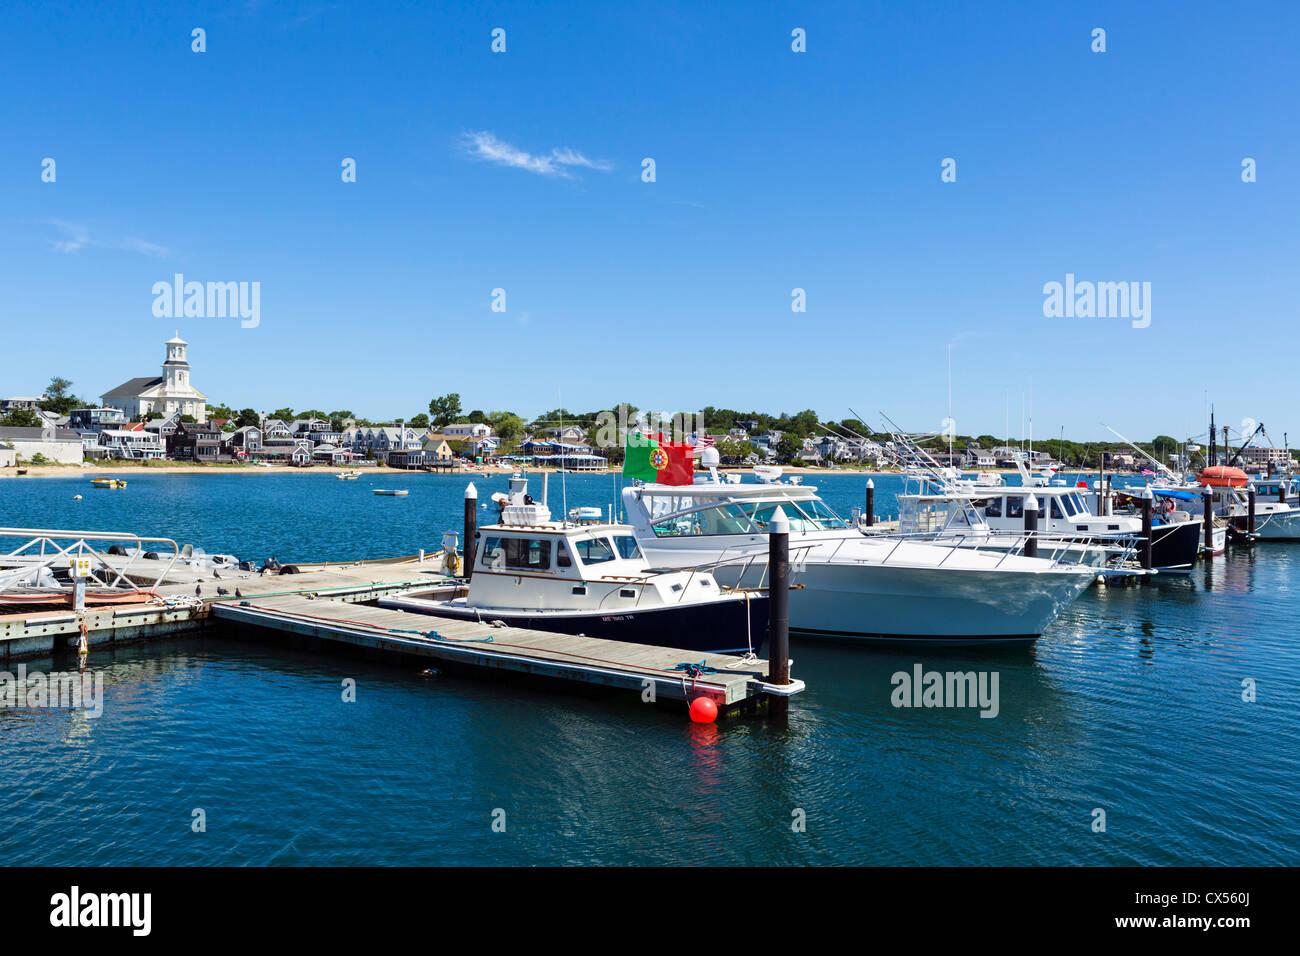 Provincetown Pier Stock Photos & Provincetown Pier Stock Images - Alamy